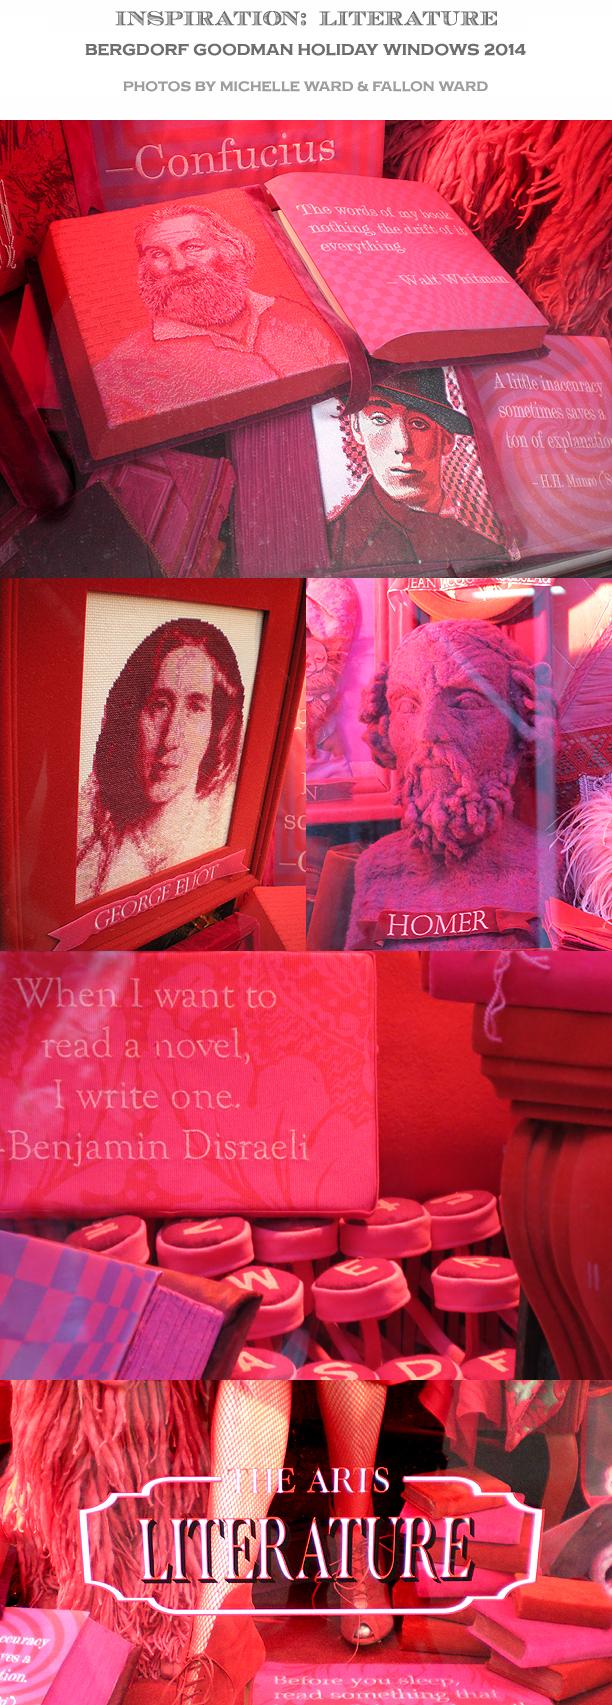 MW BG WINDOWS 2014 literature more